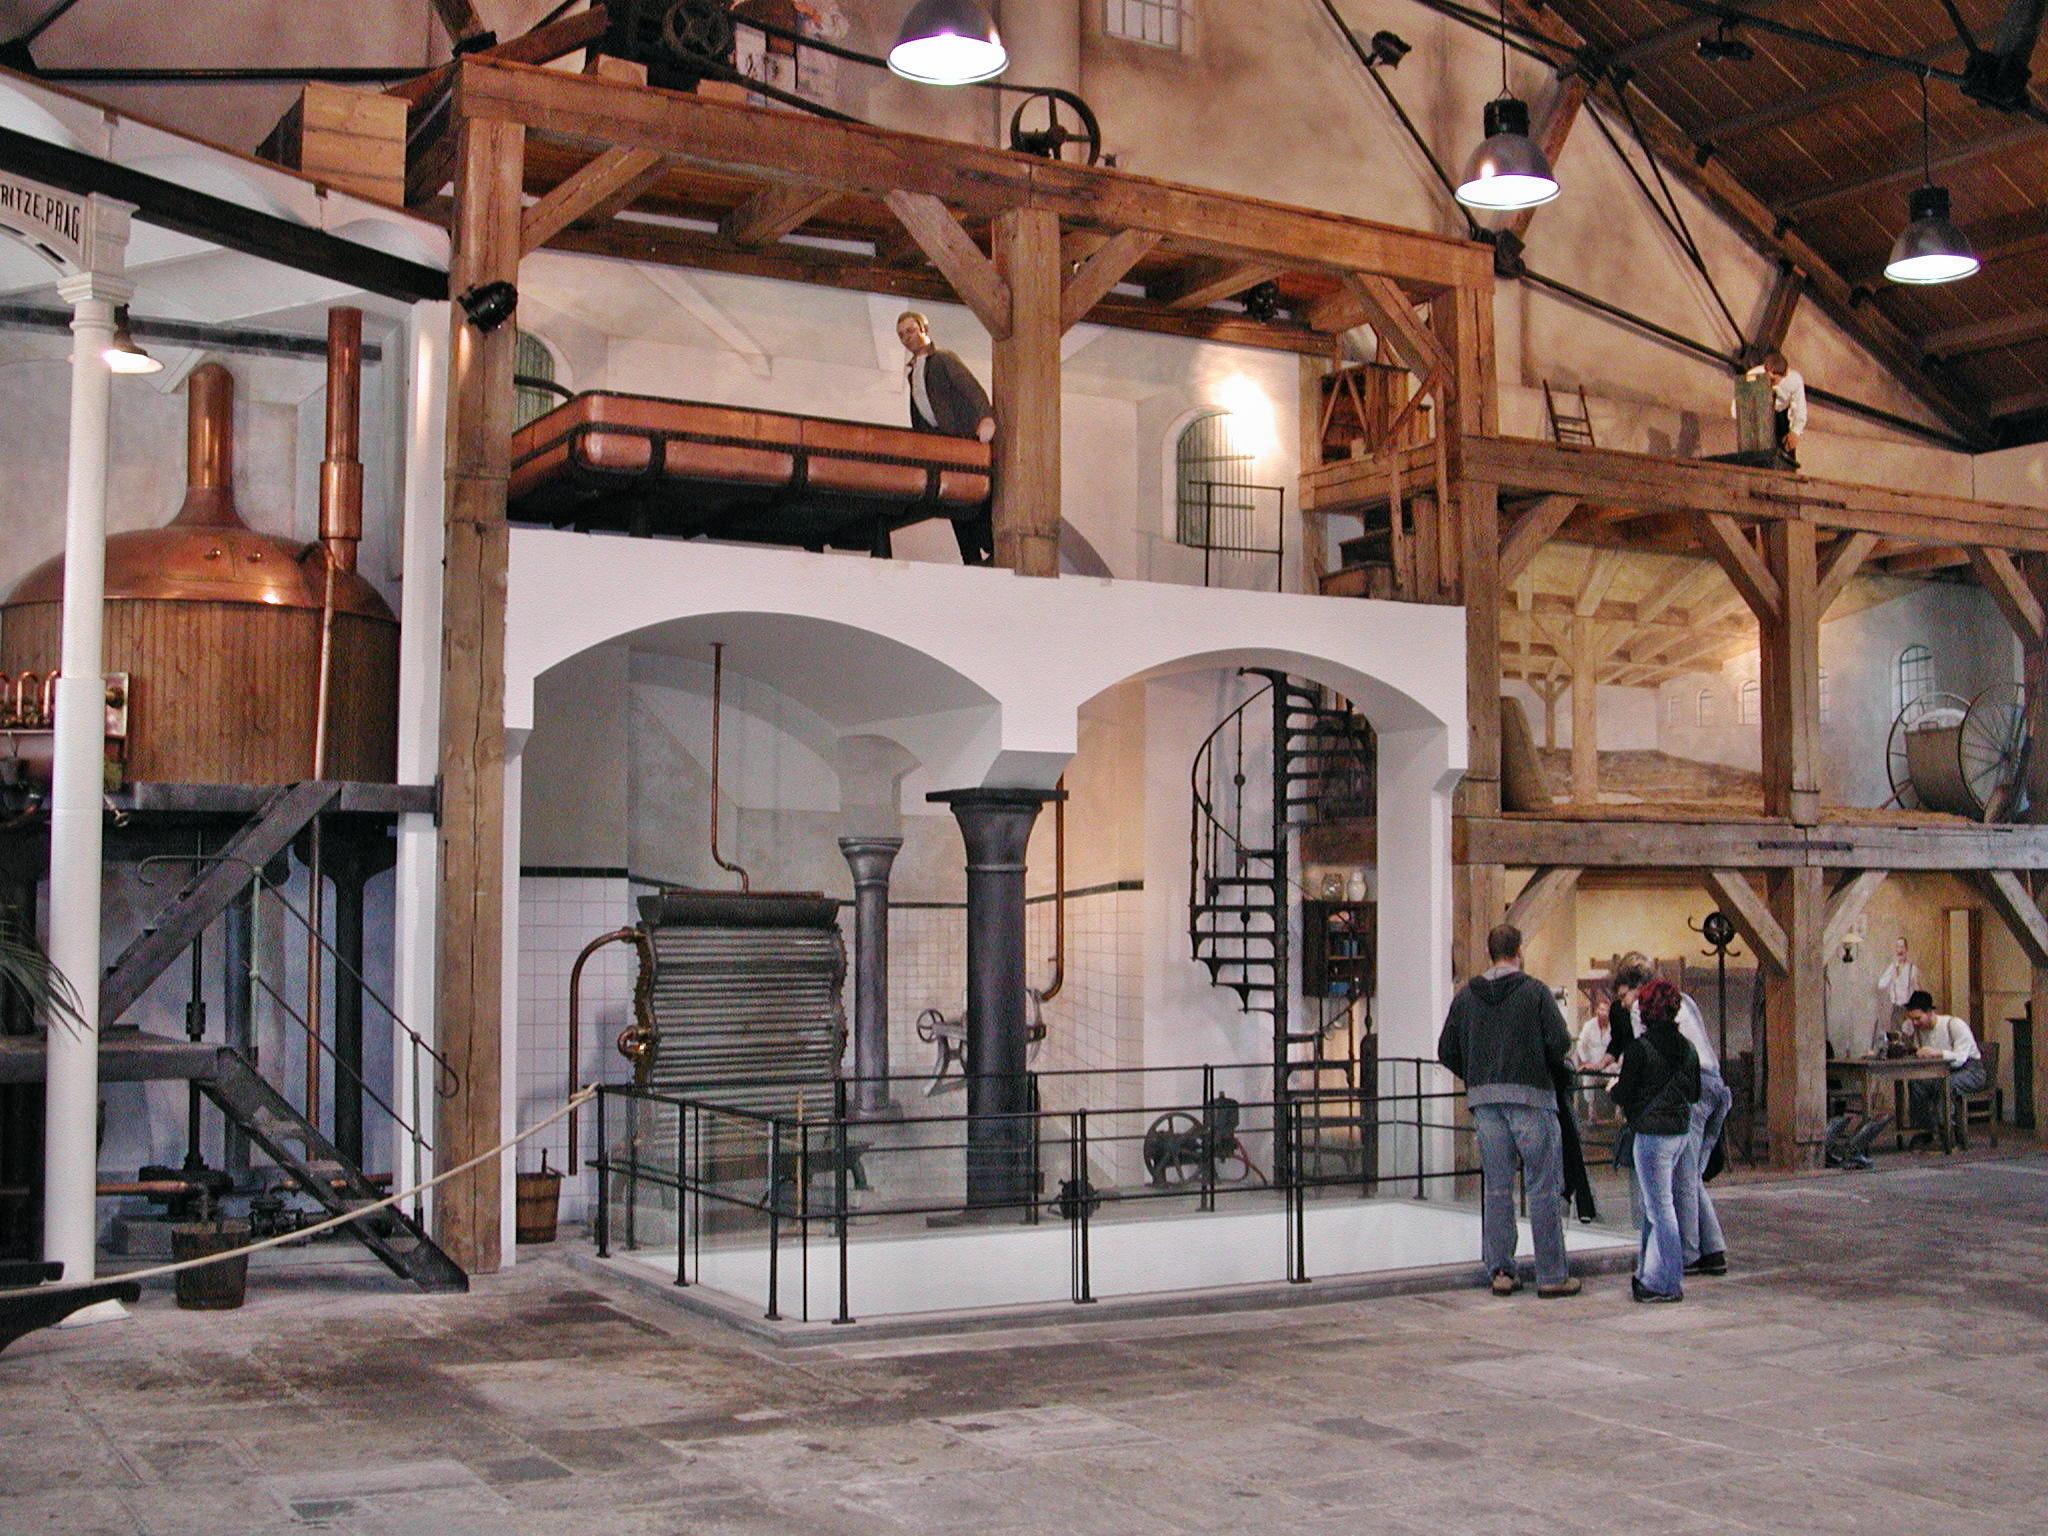 pilsener-brewery-2.jpeg